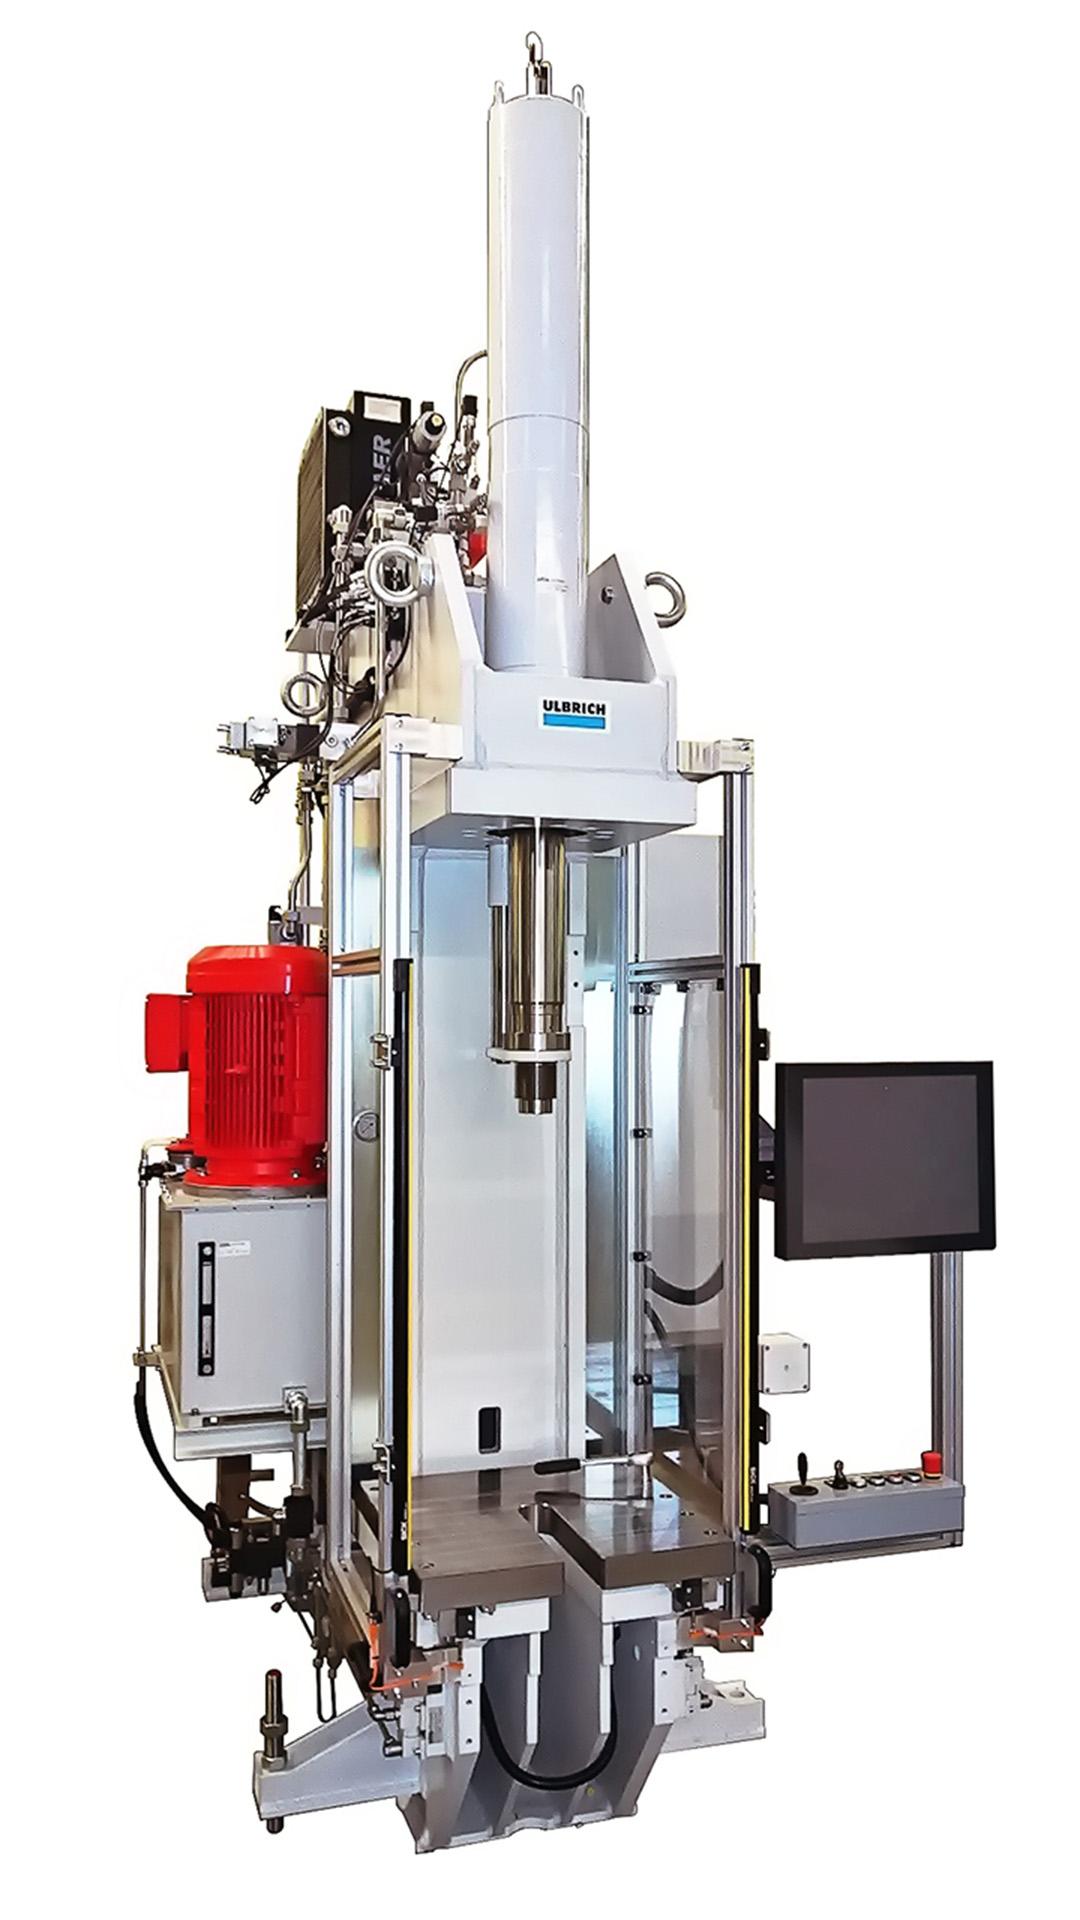 ulbrich-maschinenbau-c-rahmenmontagepresse